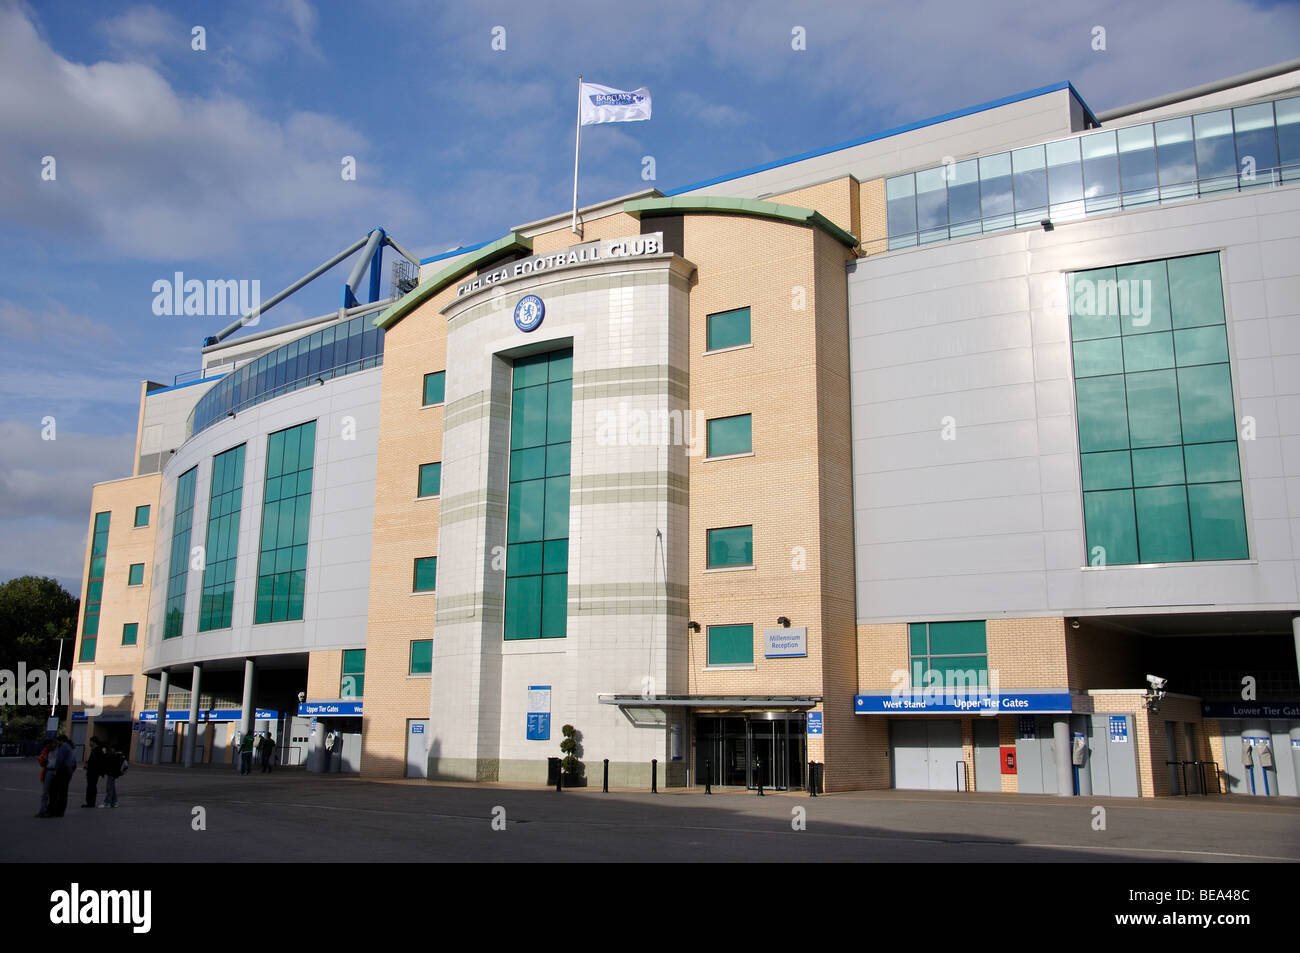 Chelsea's Stanford Bridge Football Ground, Fulham, London Borough of Hammersmith and Fulham, London, England, - Stock Image